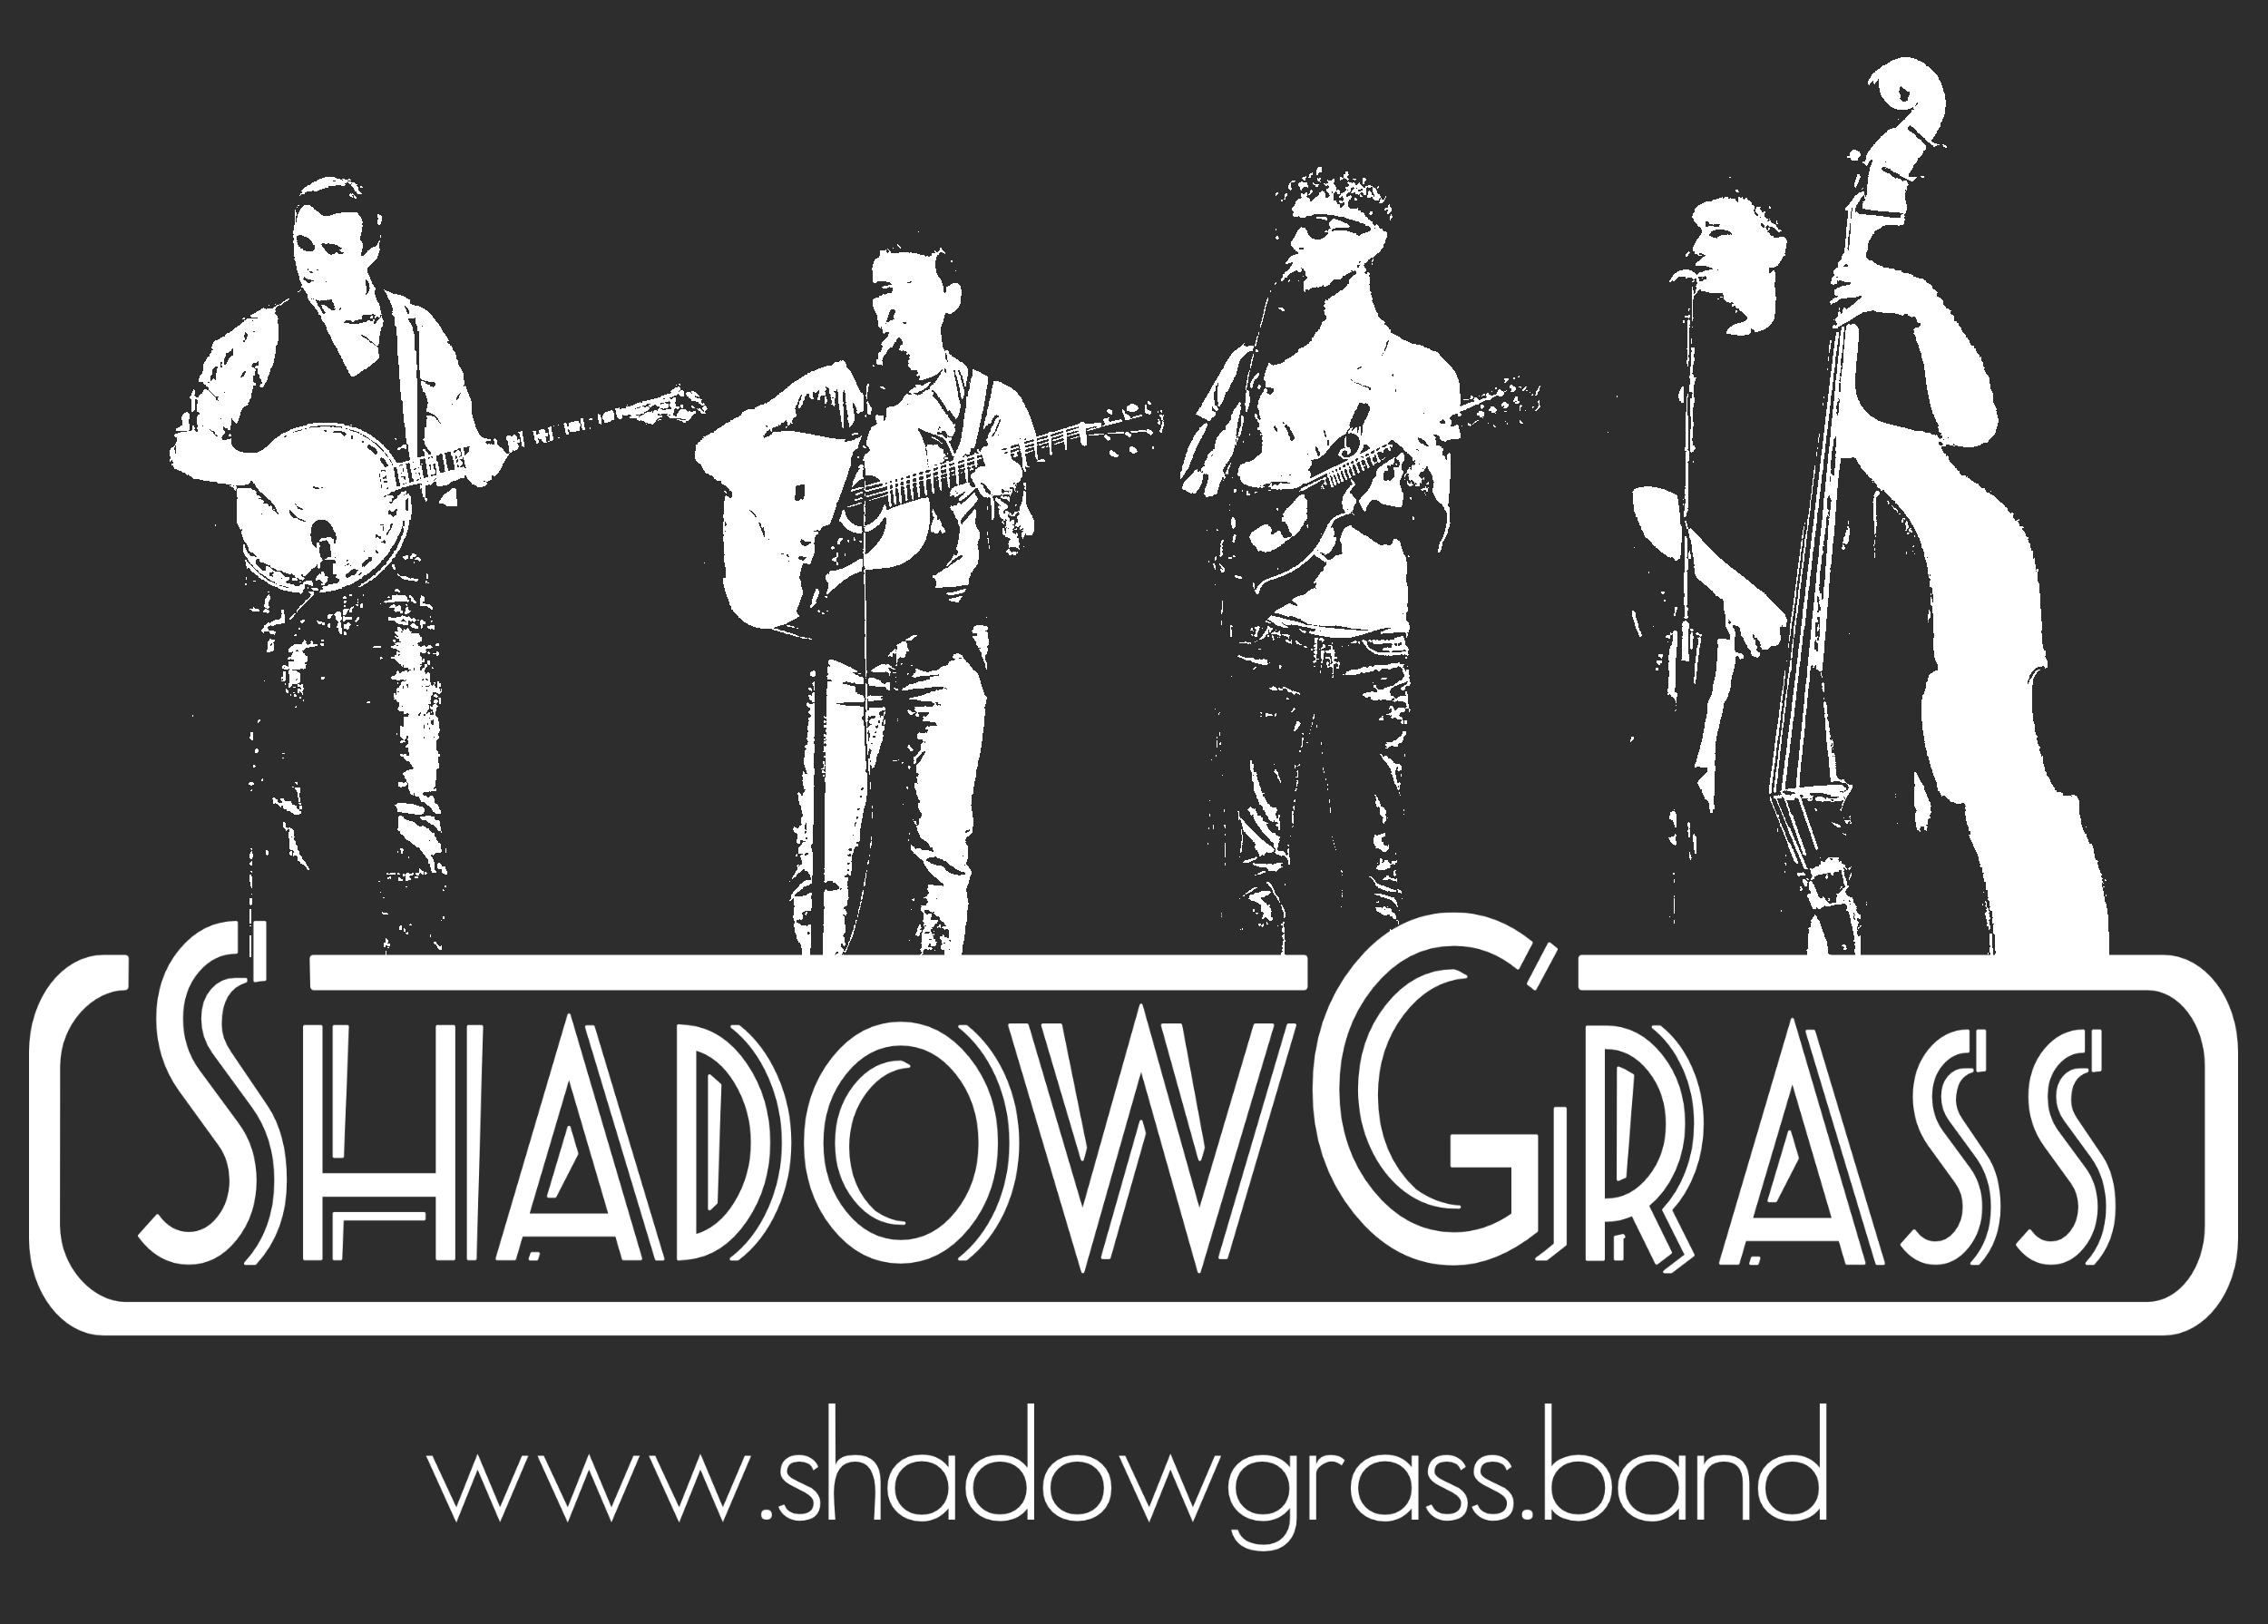 Shadowgrass